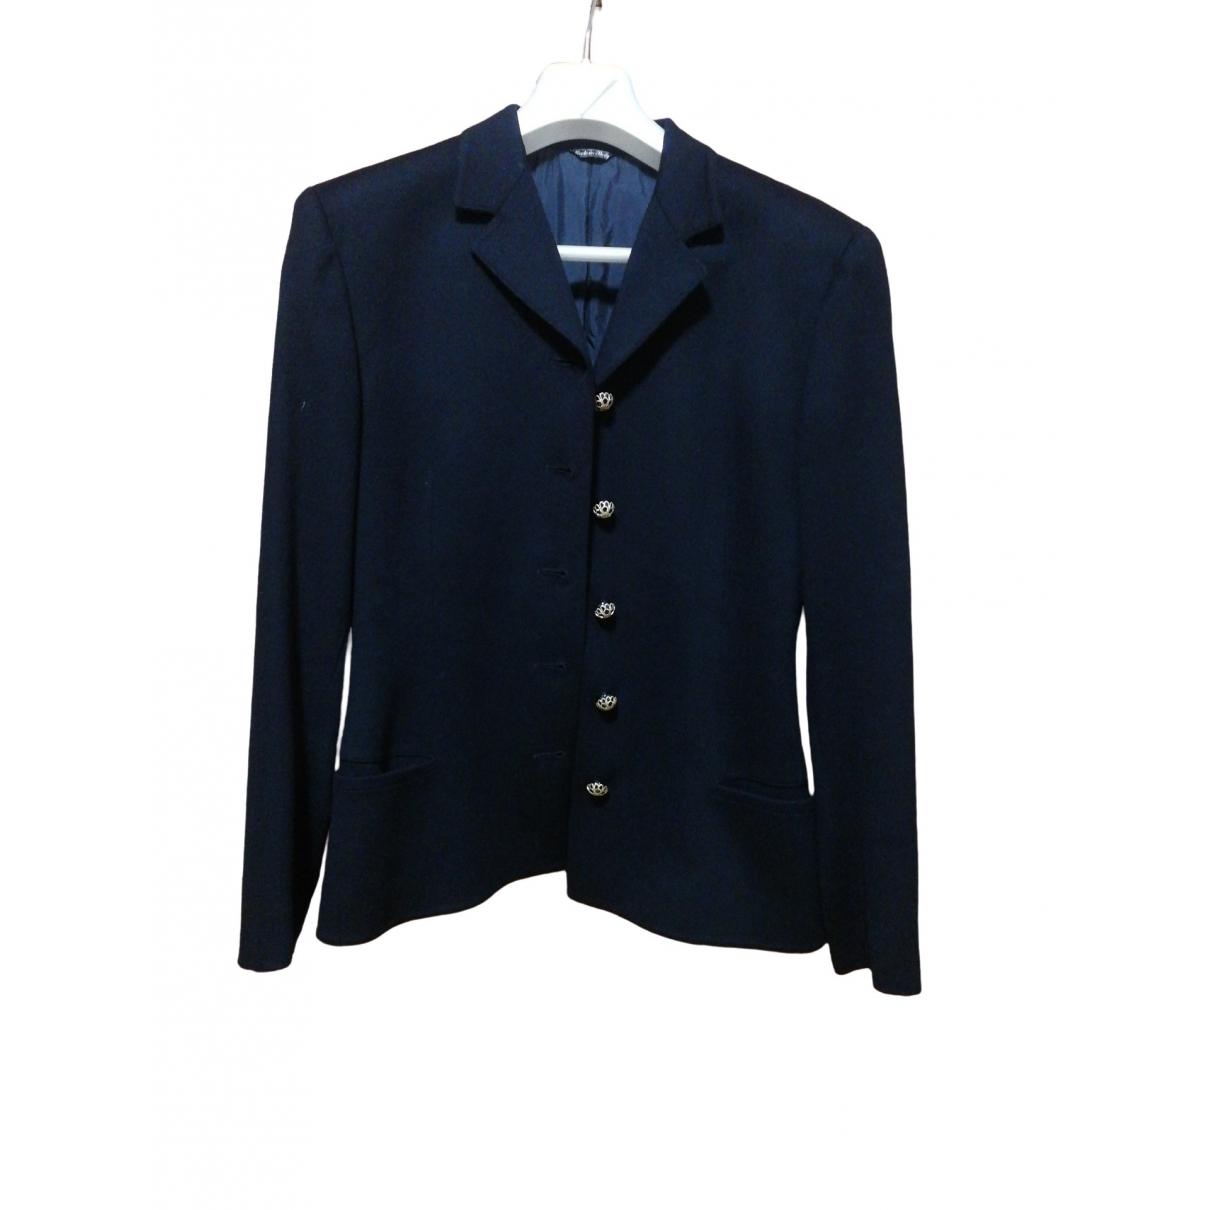 Gianni Versace \N Black Wool jacket for Women 44 FR